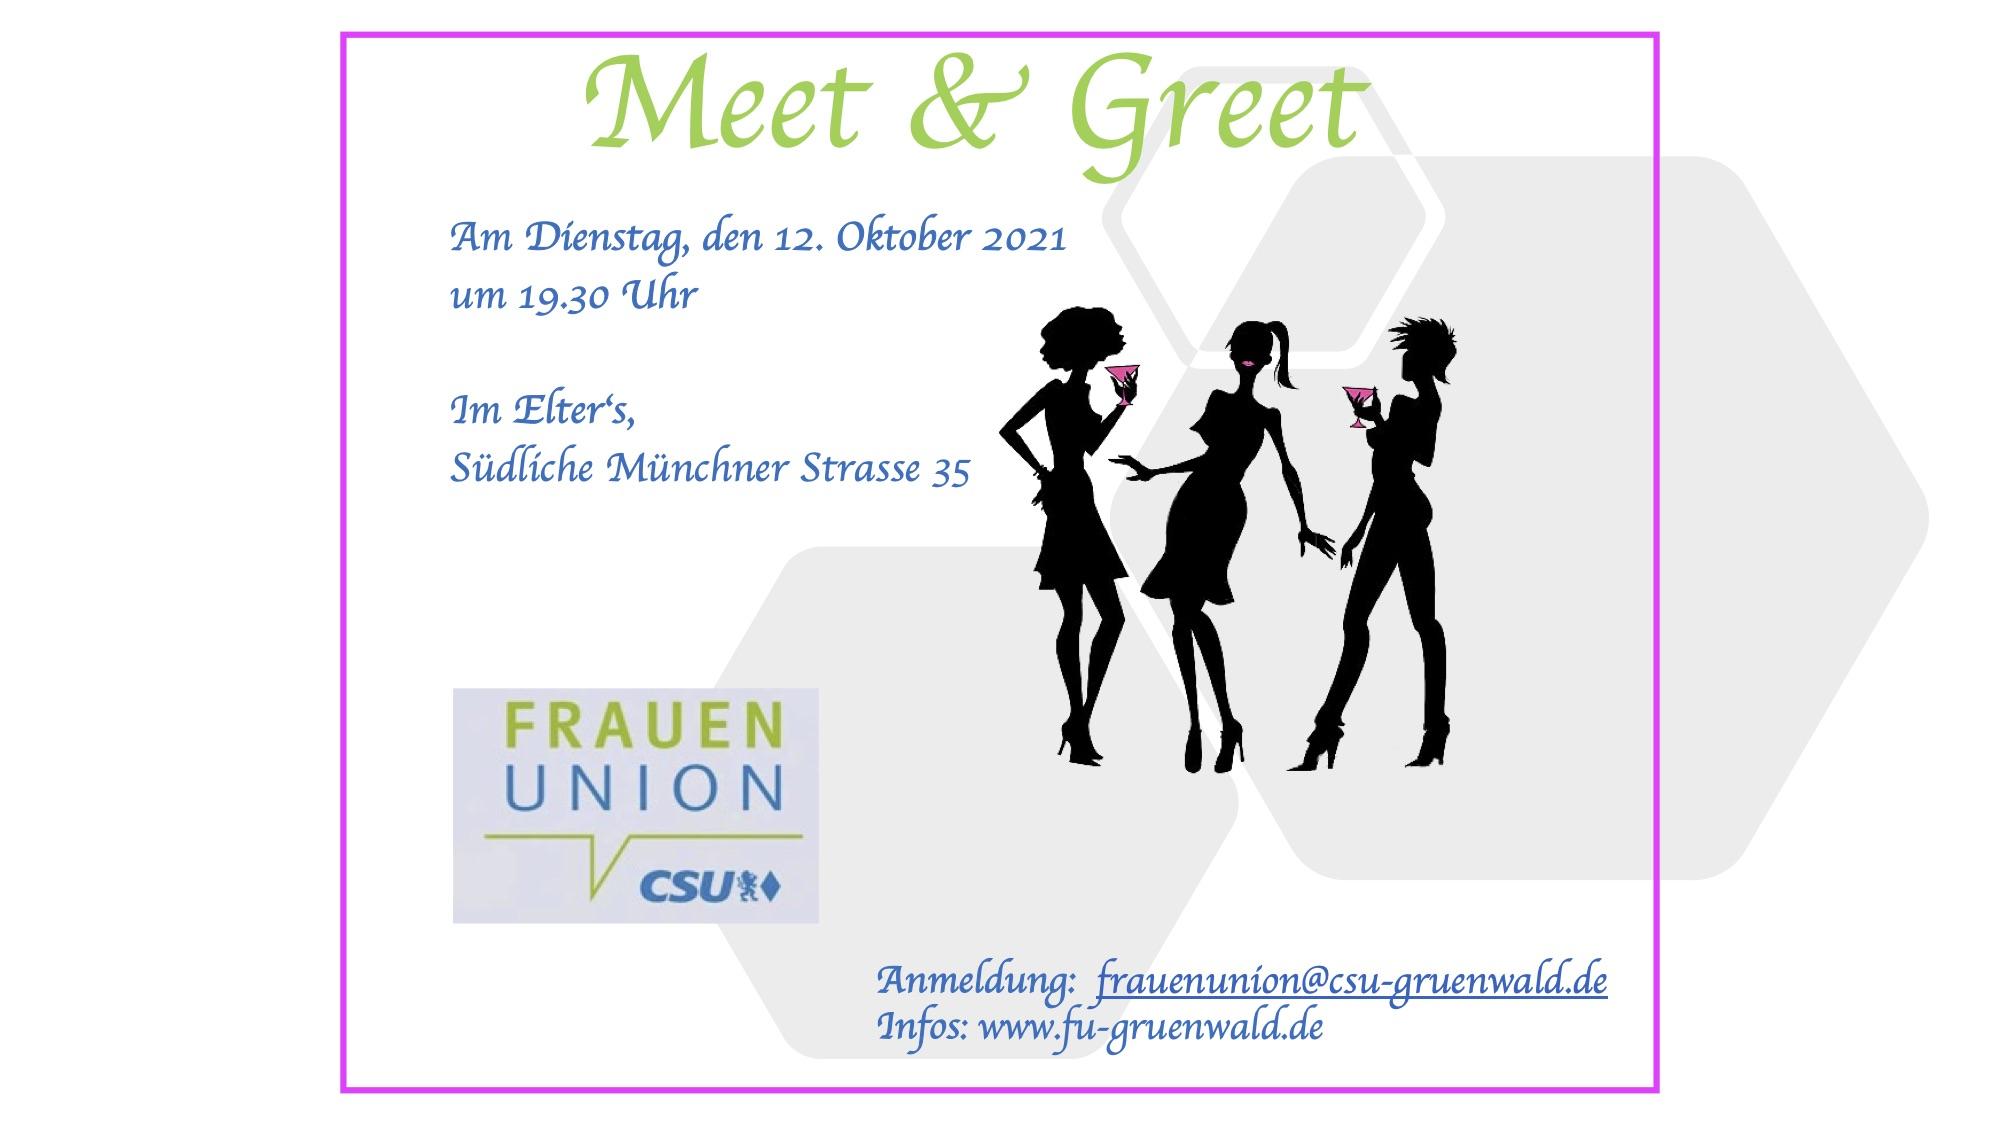 Meet & Greet Einladung 2